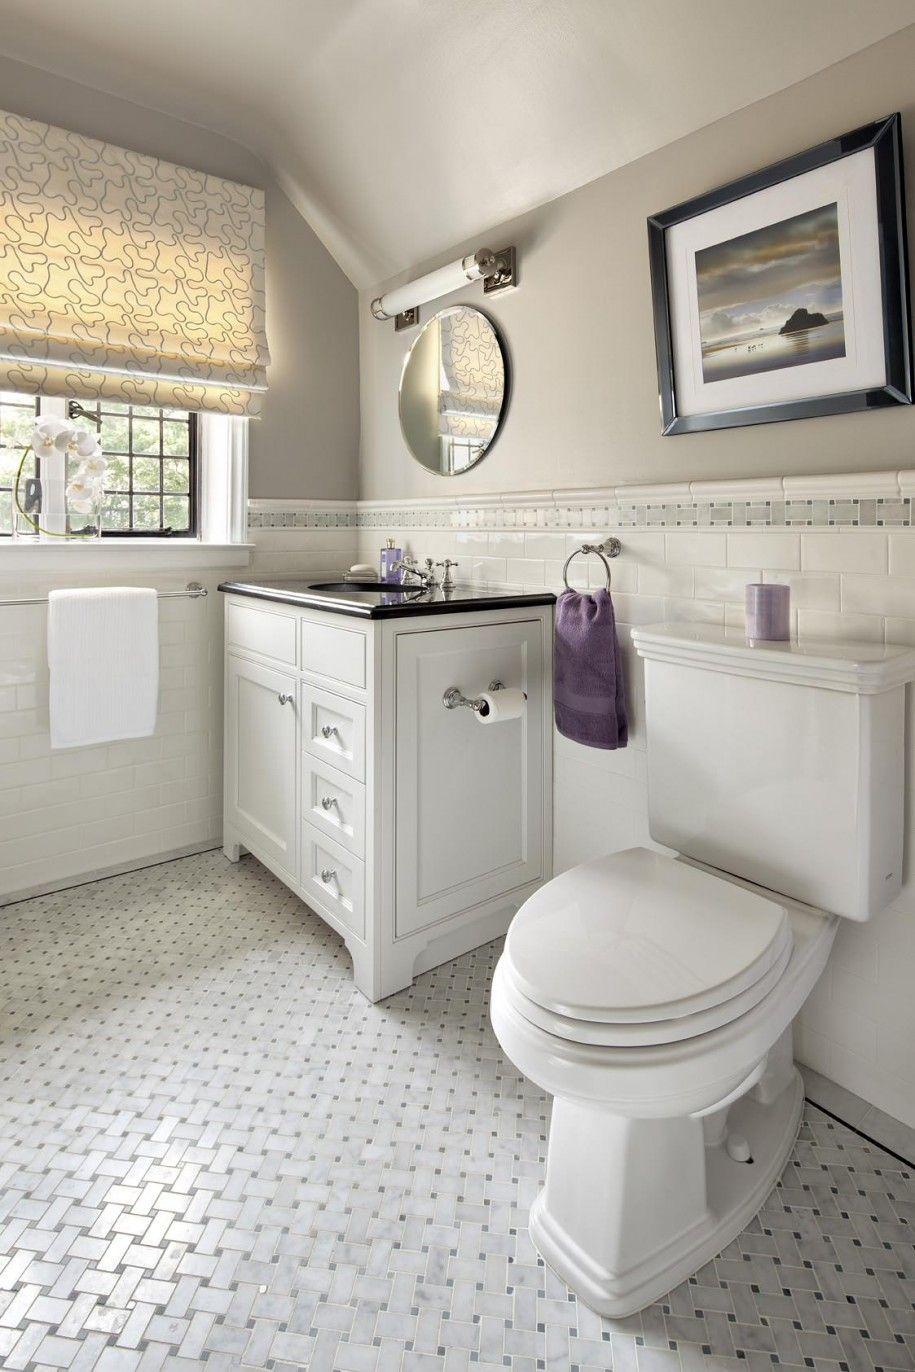 Best Kitchen Gallery: Stunning Basket Weave Tile For Classic Bathroom Design Cool of Classic Bathroom Design  on rachelxblog.com